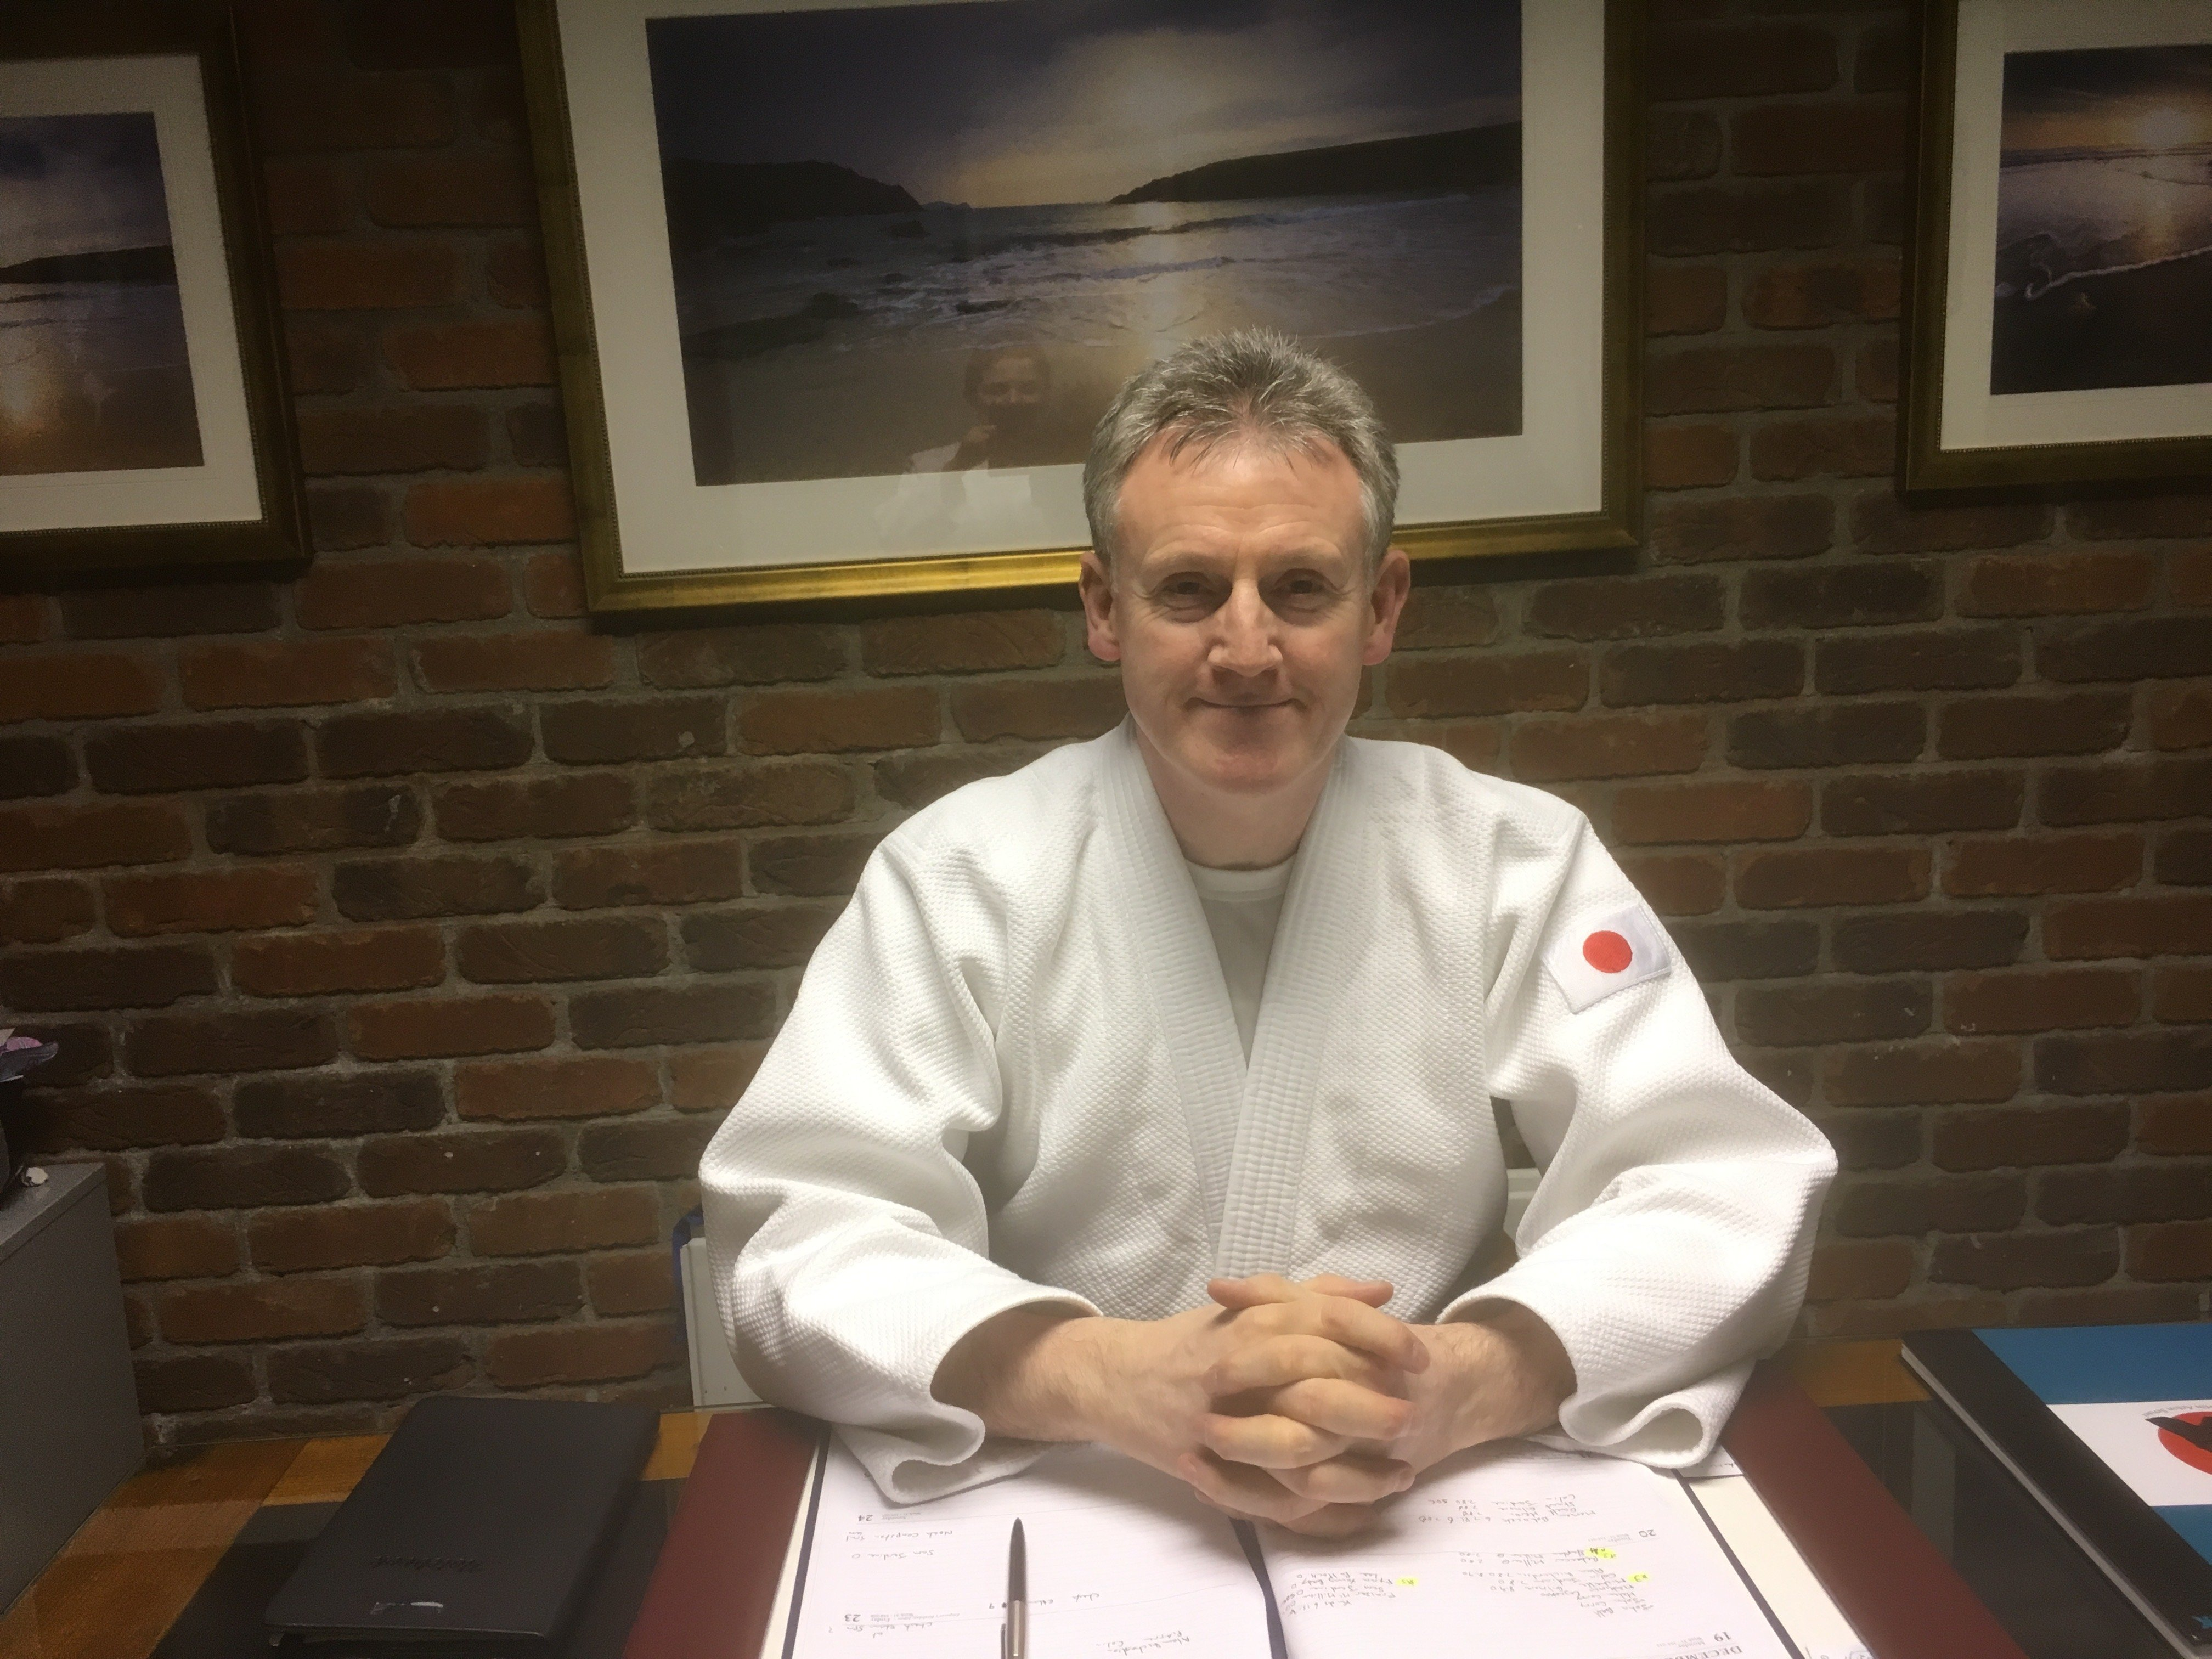 Martin Acton sensei sitting at his desk. Martin Acton's Aikido Institute